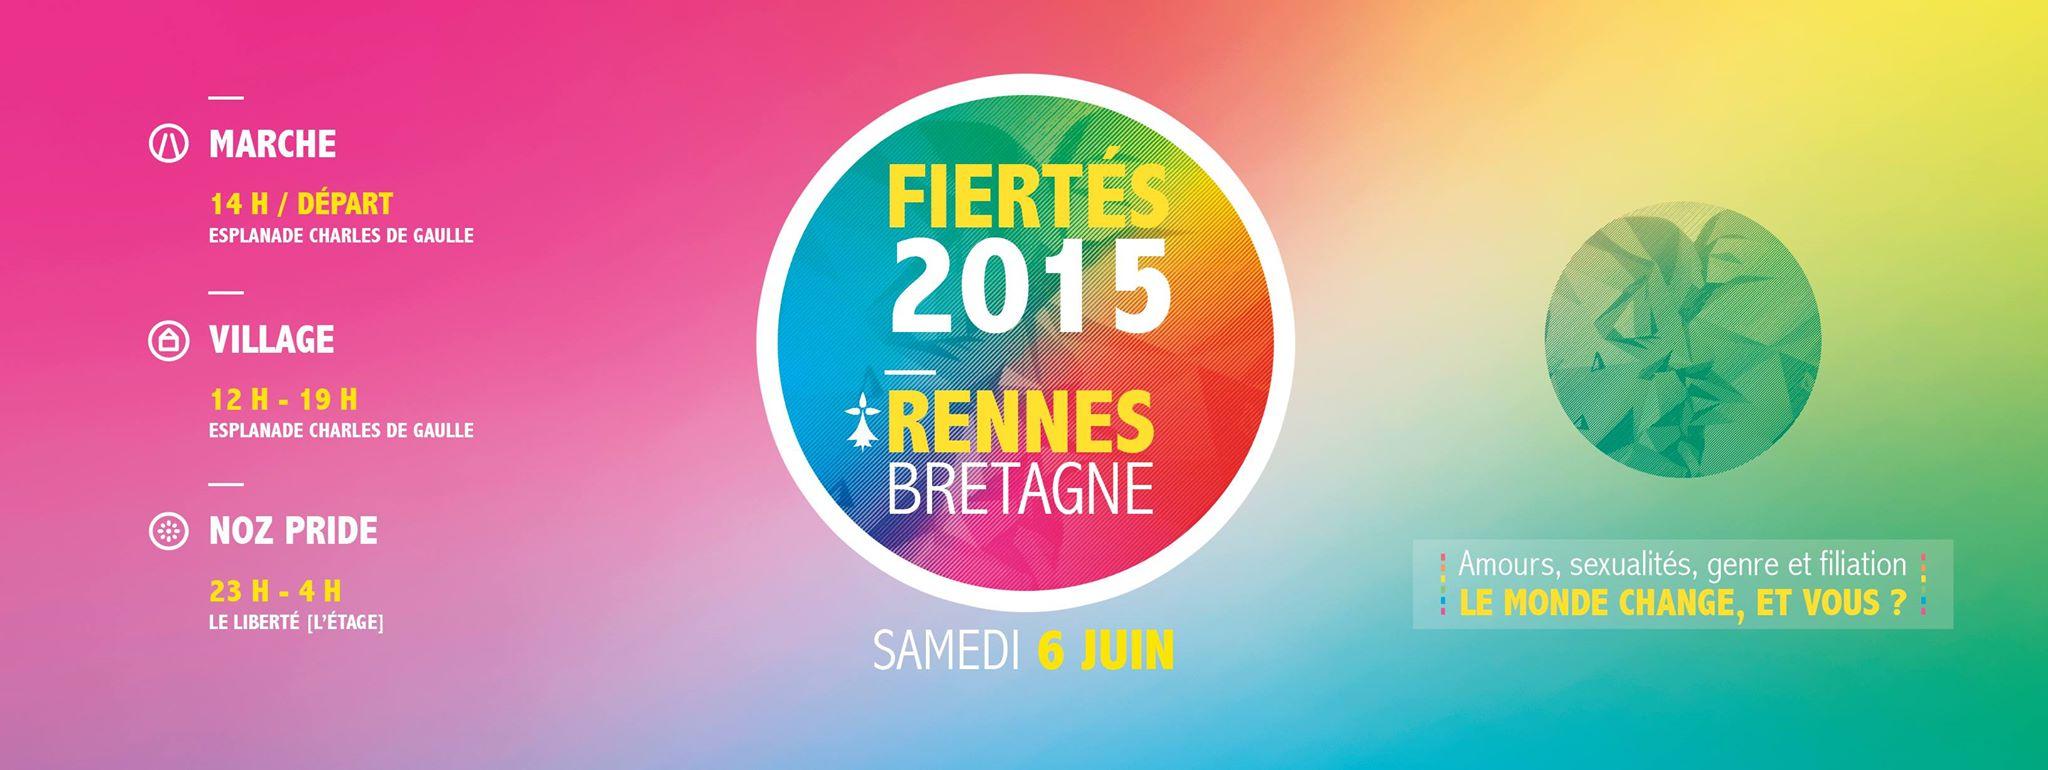 Rencontre alternative rennes 2016 facebook